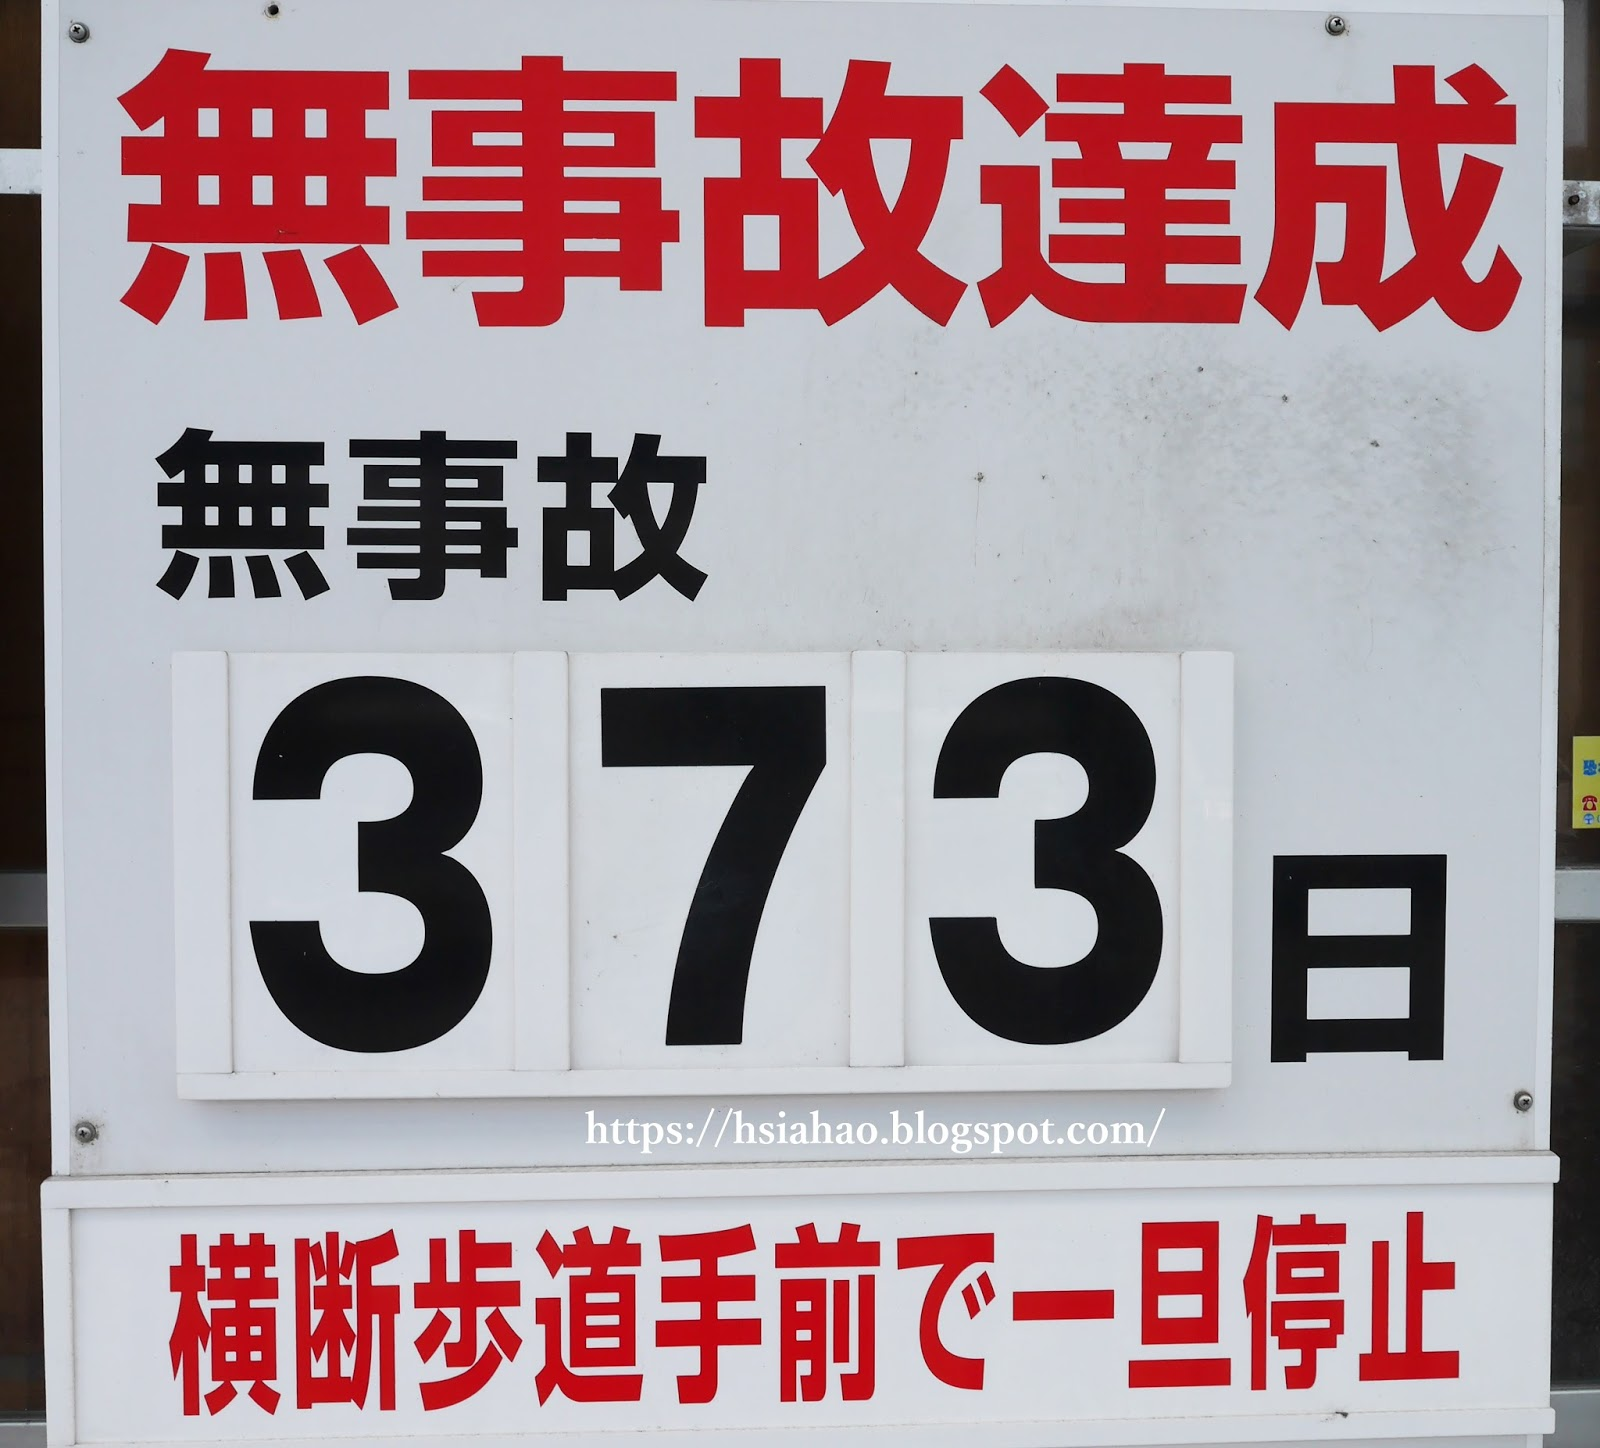 沖繩-那霸-交通-巴士-看板-自由行-旅遊-Okinawa-bus-board